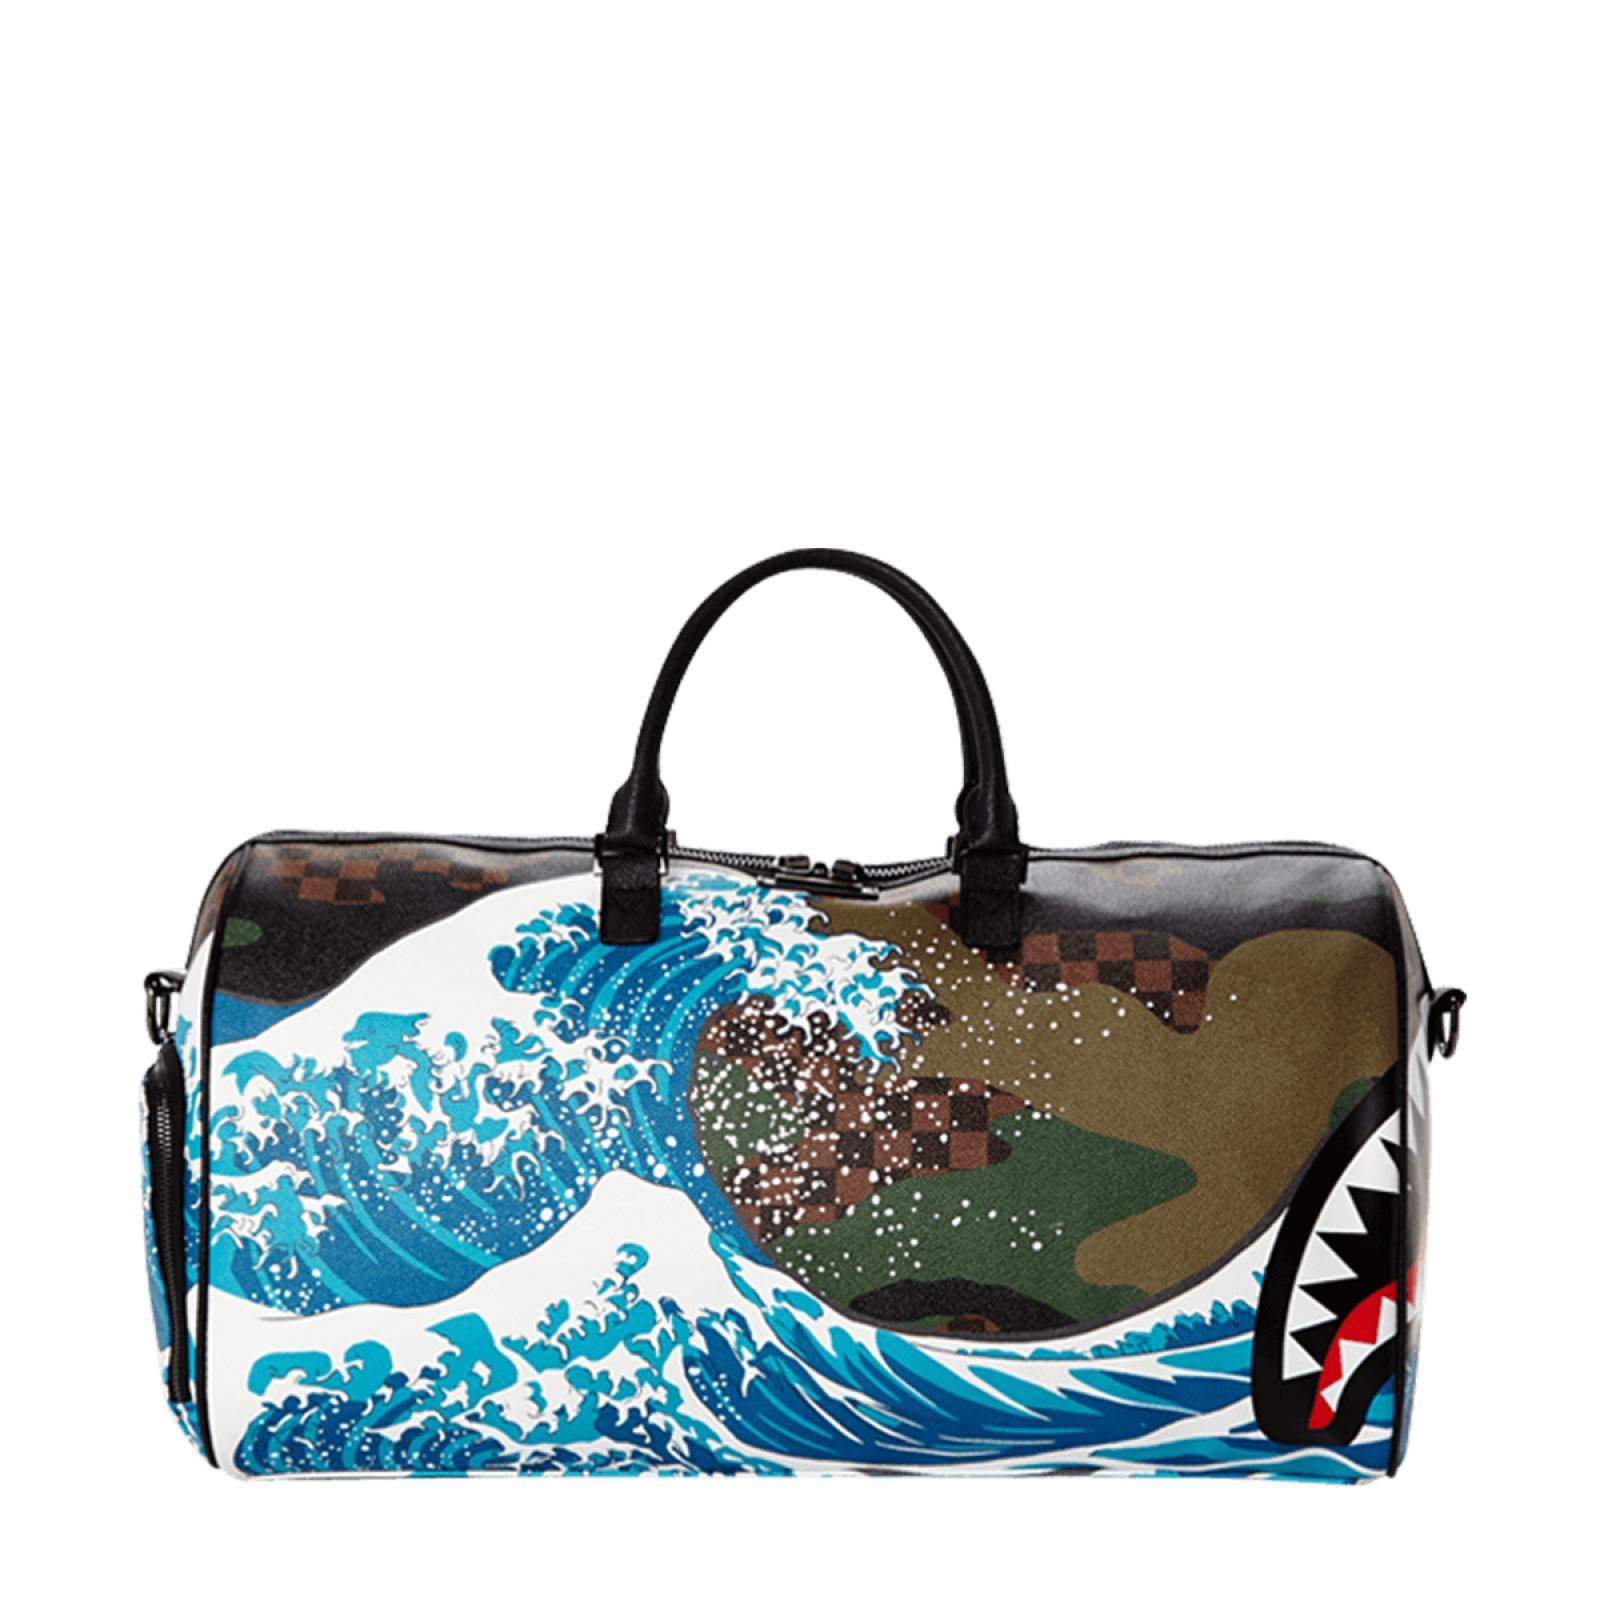 Sprayground Borsone Camowaka Wave Limited Edition - 1